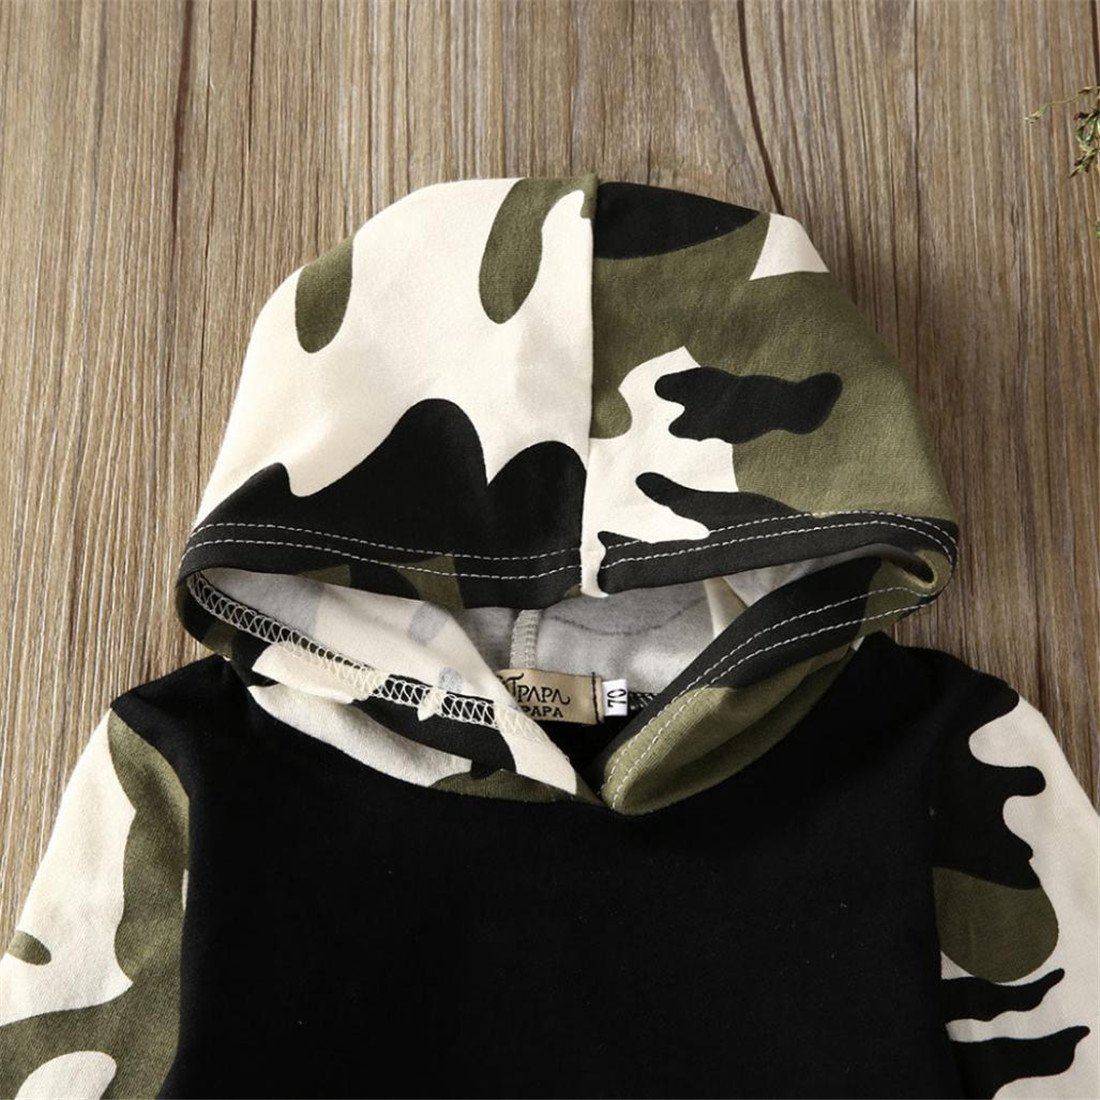 Pullover Set Kleinkind Btruely Unisex Langarm Baby Clothes Set Camouflage Spielanzug 60, Camouflage 1 Hosen Kappe Outfits Kinder